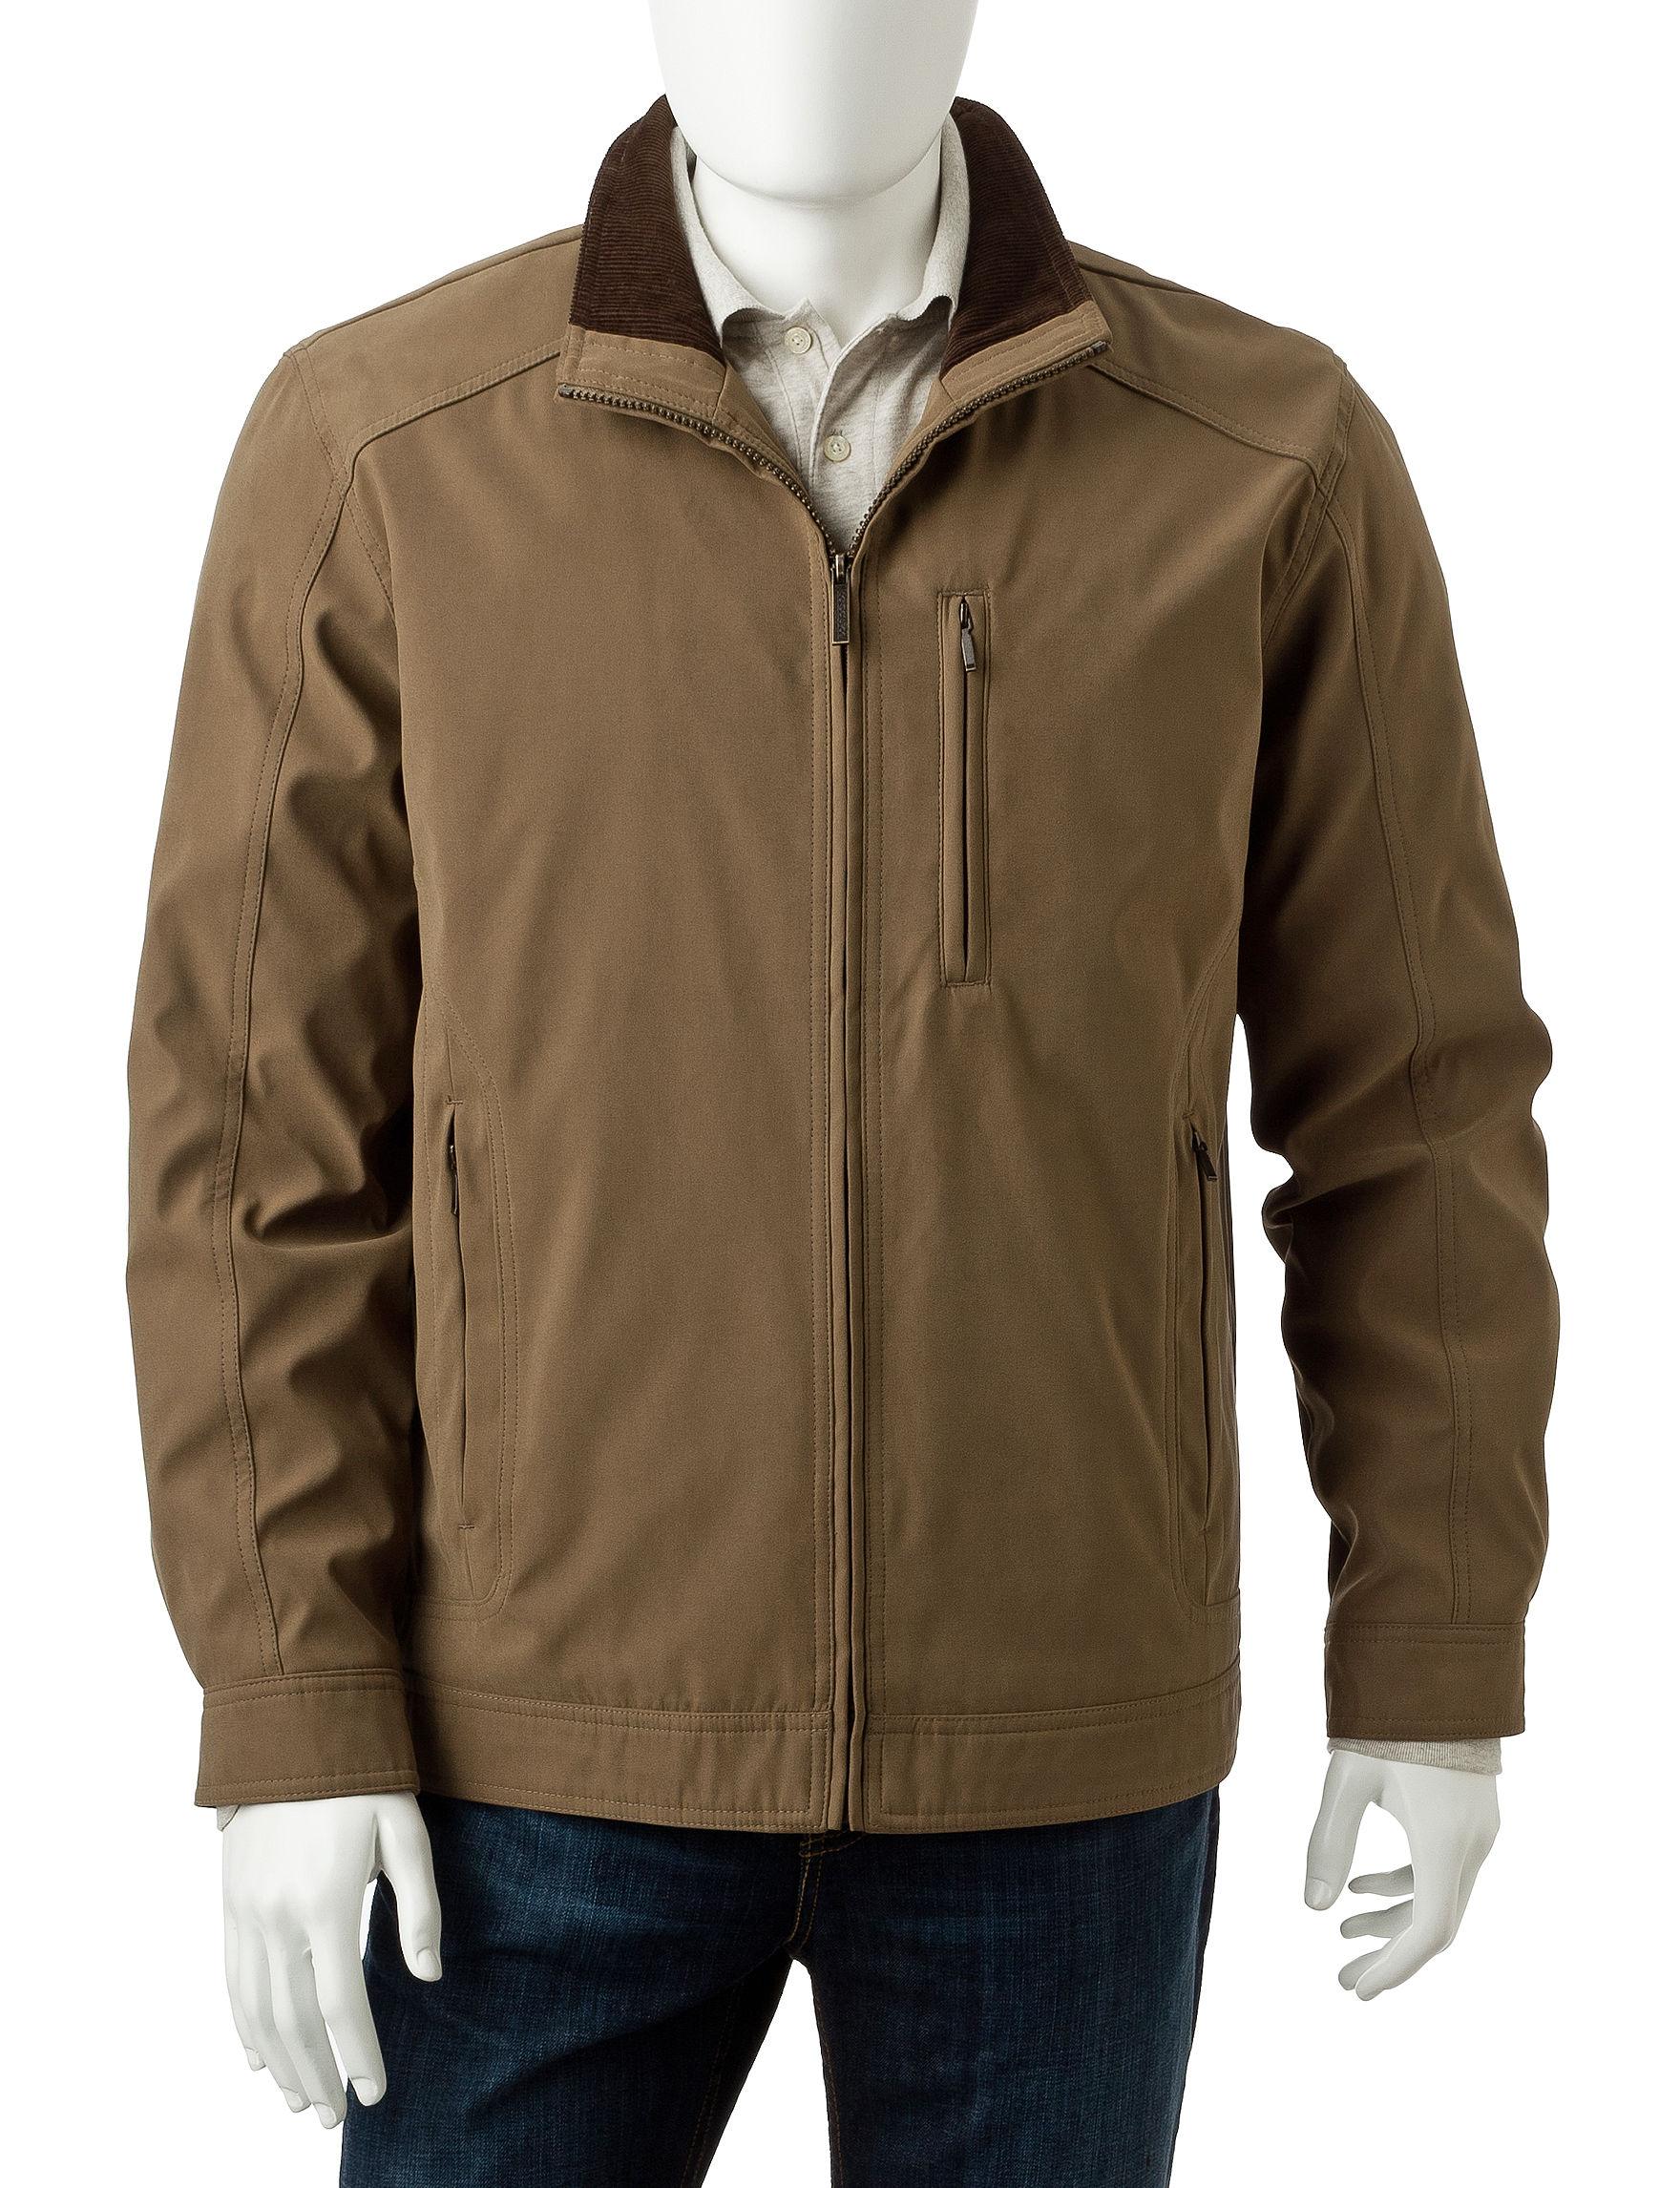 London Fog Khaki Lightweight Jackets & Blazers